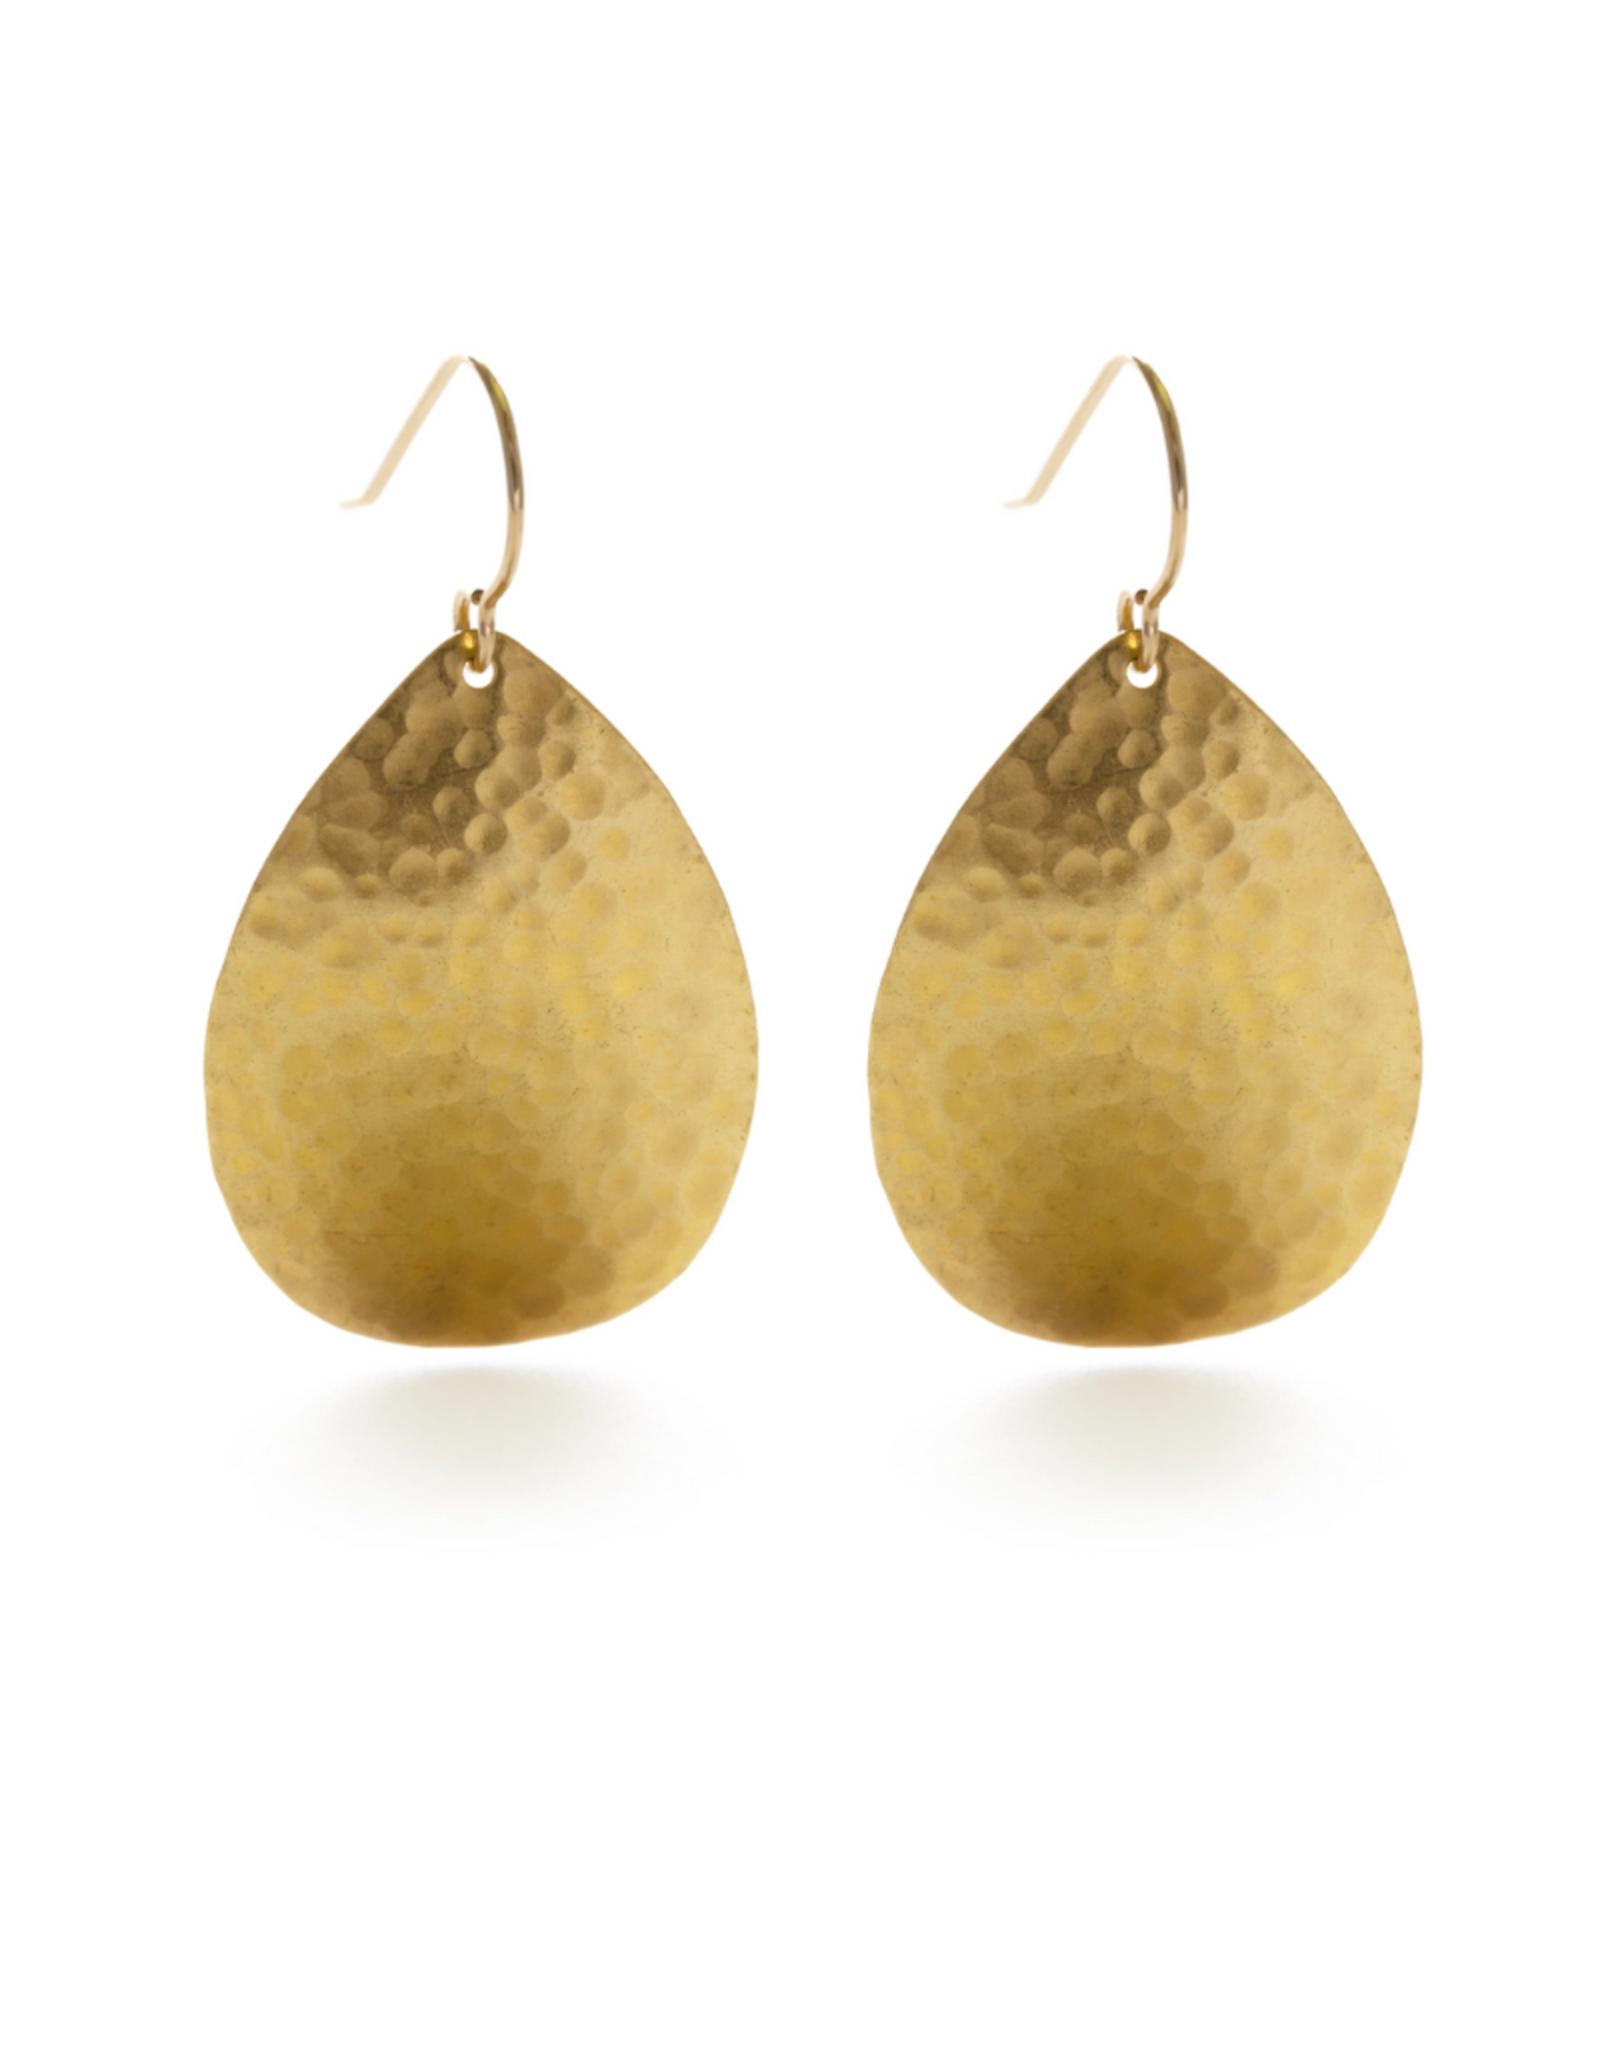 Faire/Amano Studio EARRINGS-HAMMERED TEARDROPS, GOLD